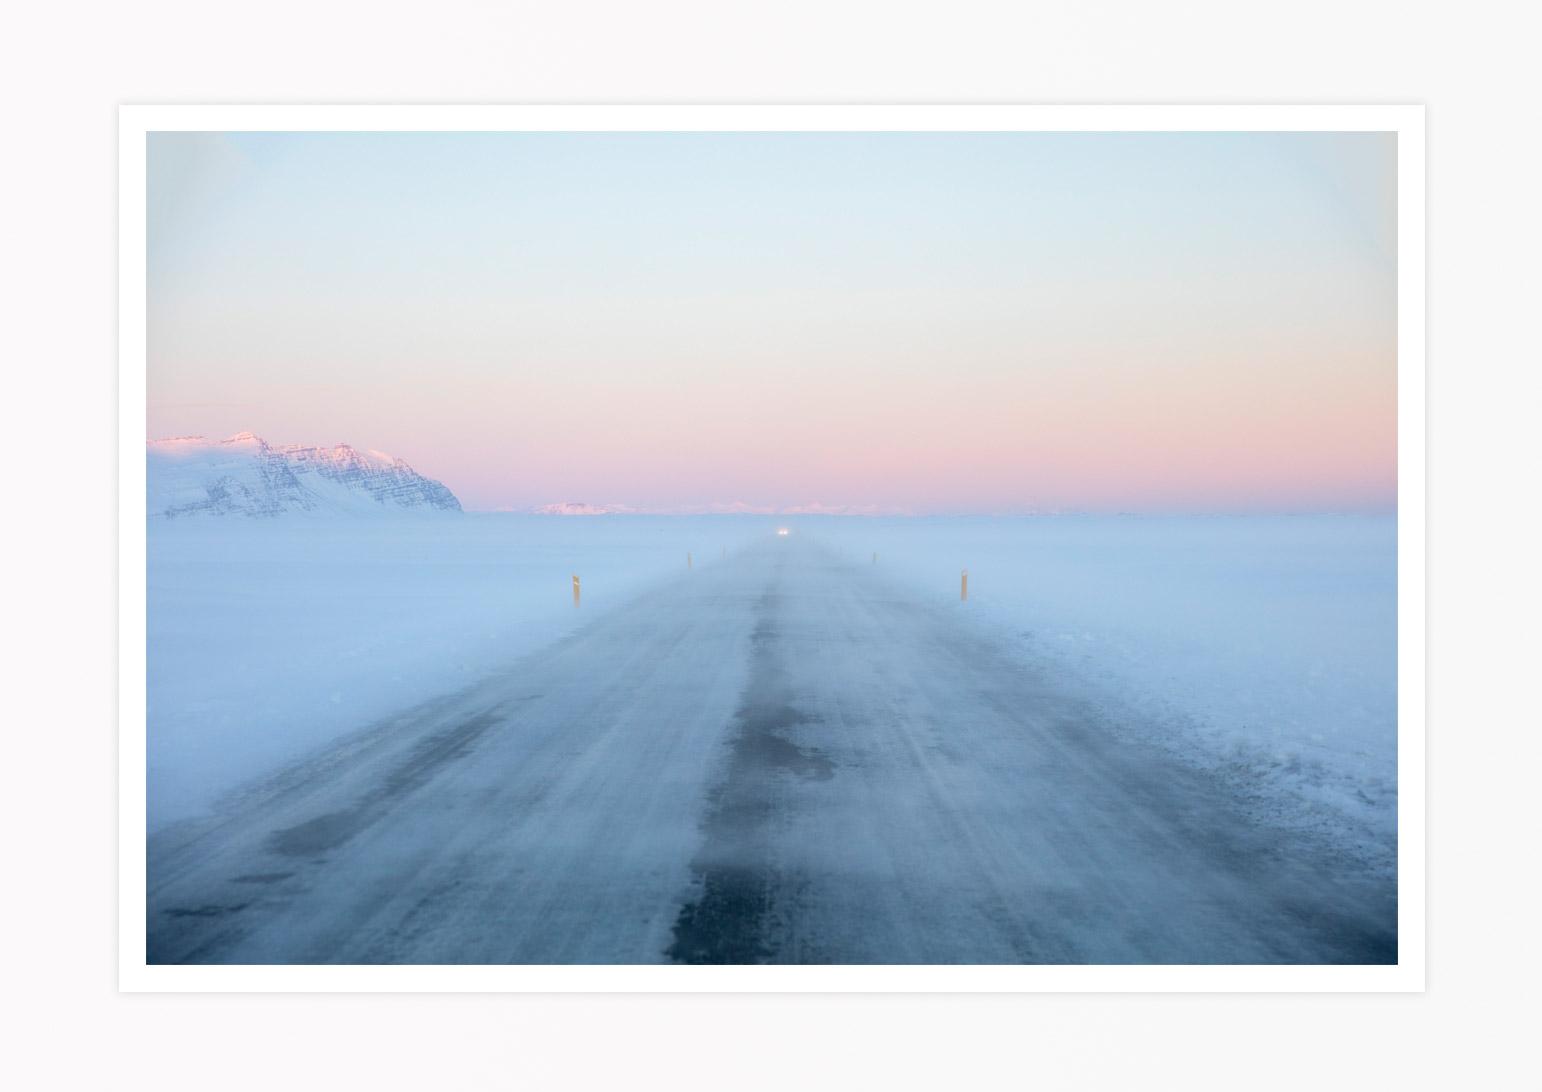 ICELAND-RINGROAD